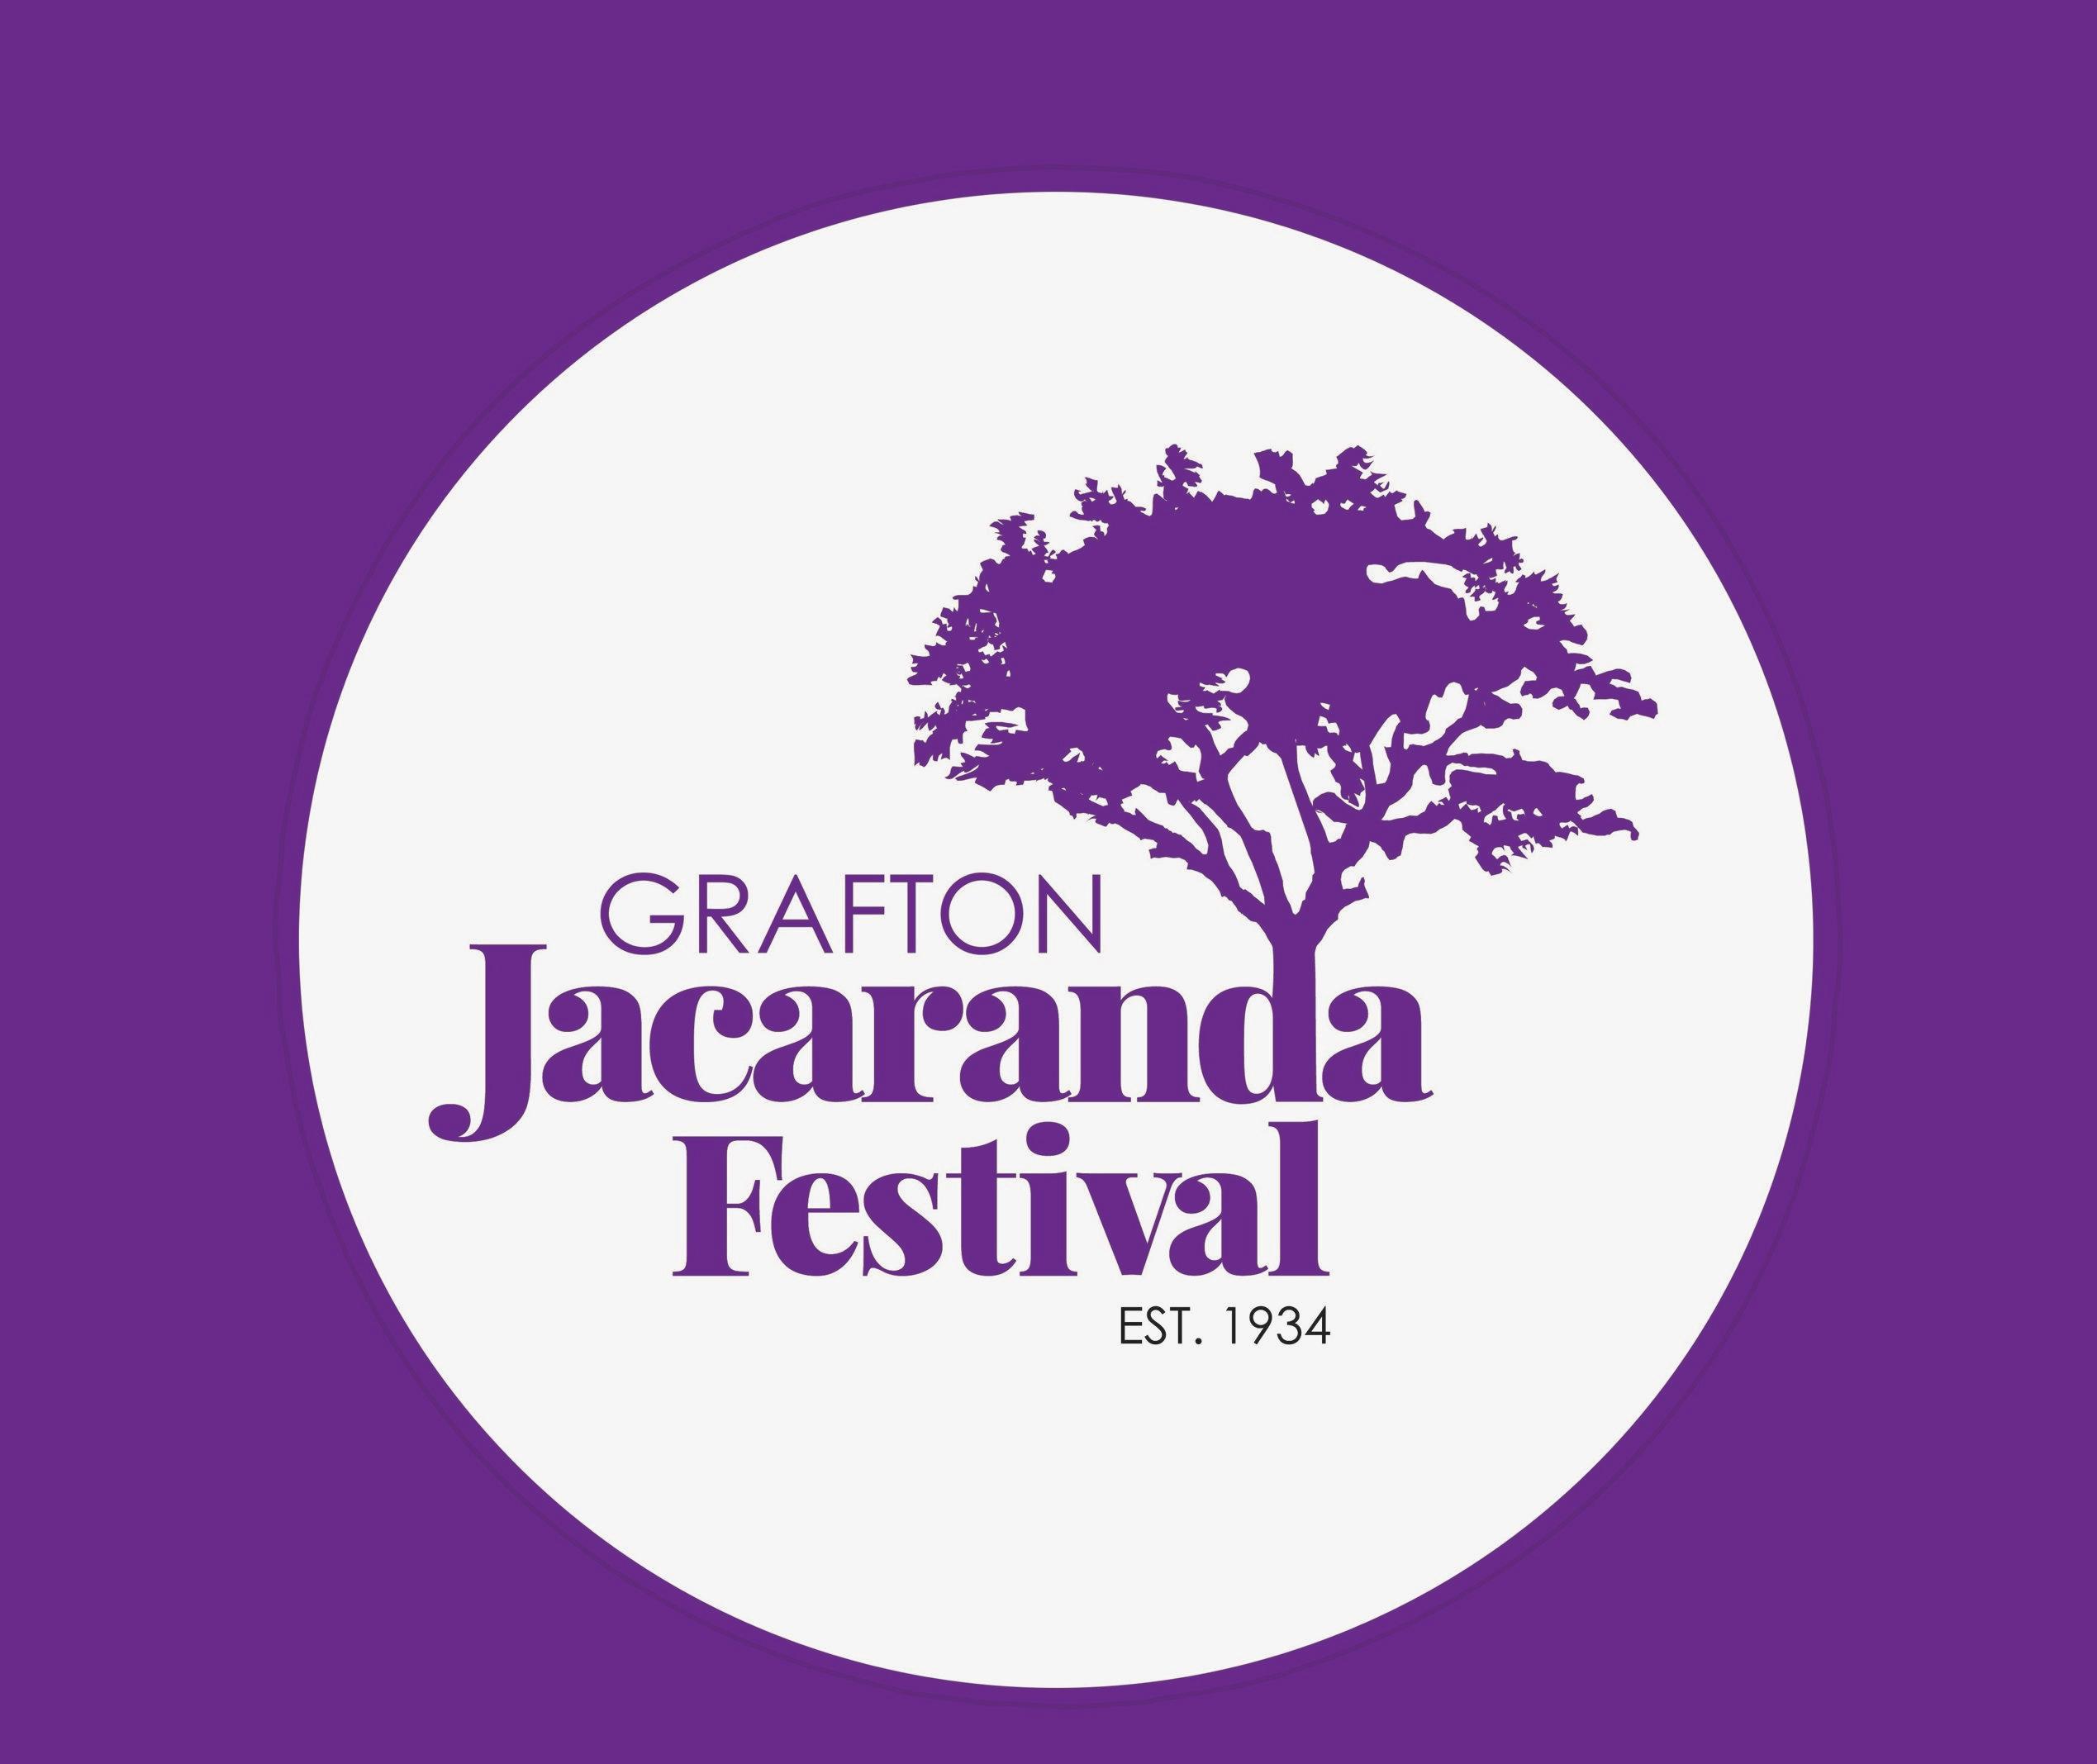 Jacaranda festival logo